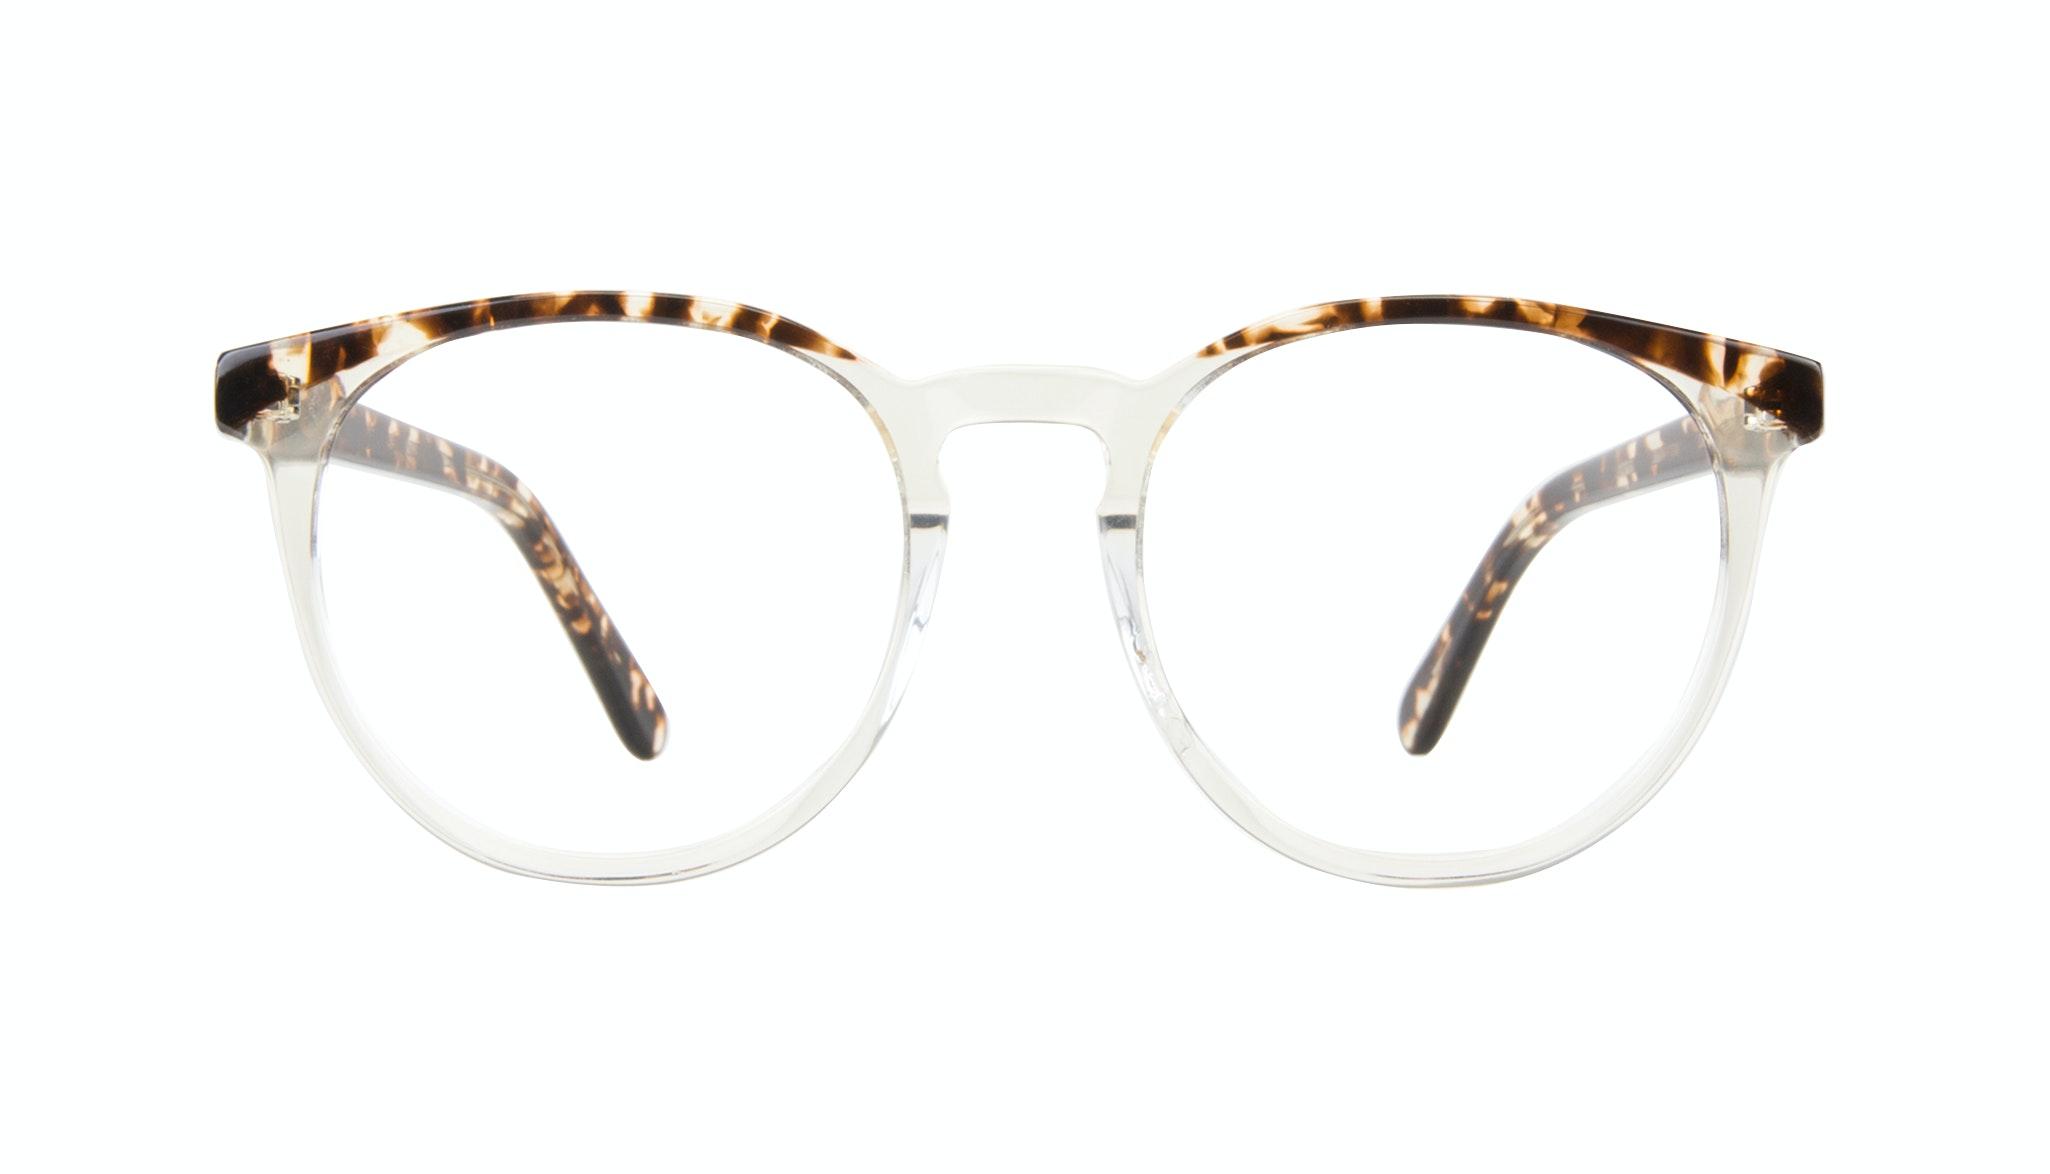 Affordable Fashion Glasses Round Eyeglasses Women Brilliant Blond Tortoise Front